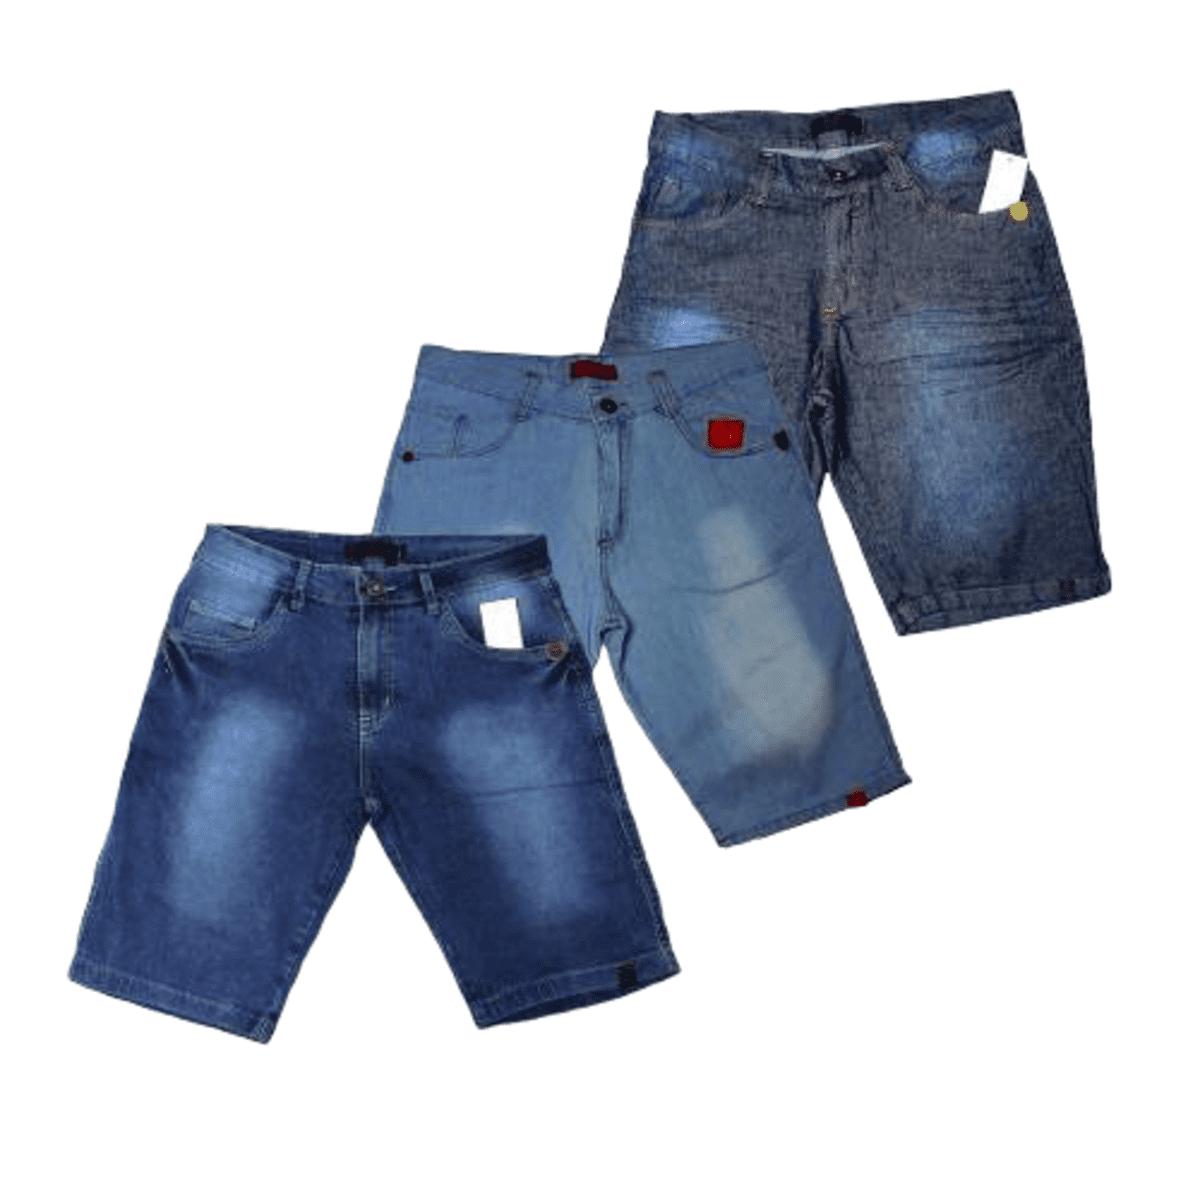 Kit 3 Bermuda Short Jeans Masculina Atacado Revenda E Lucre